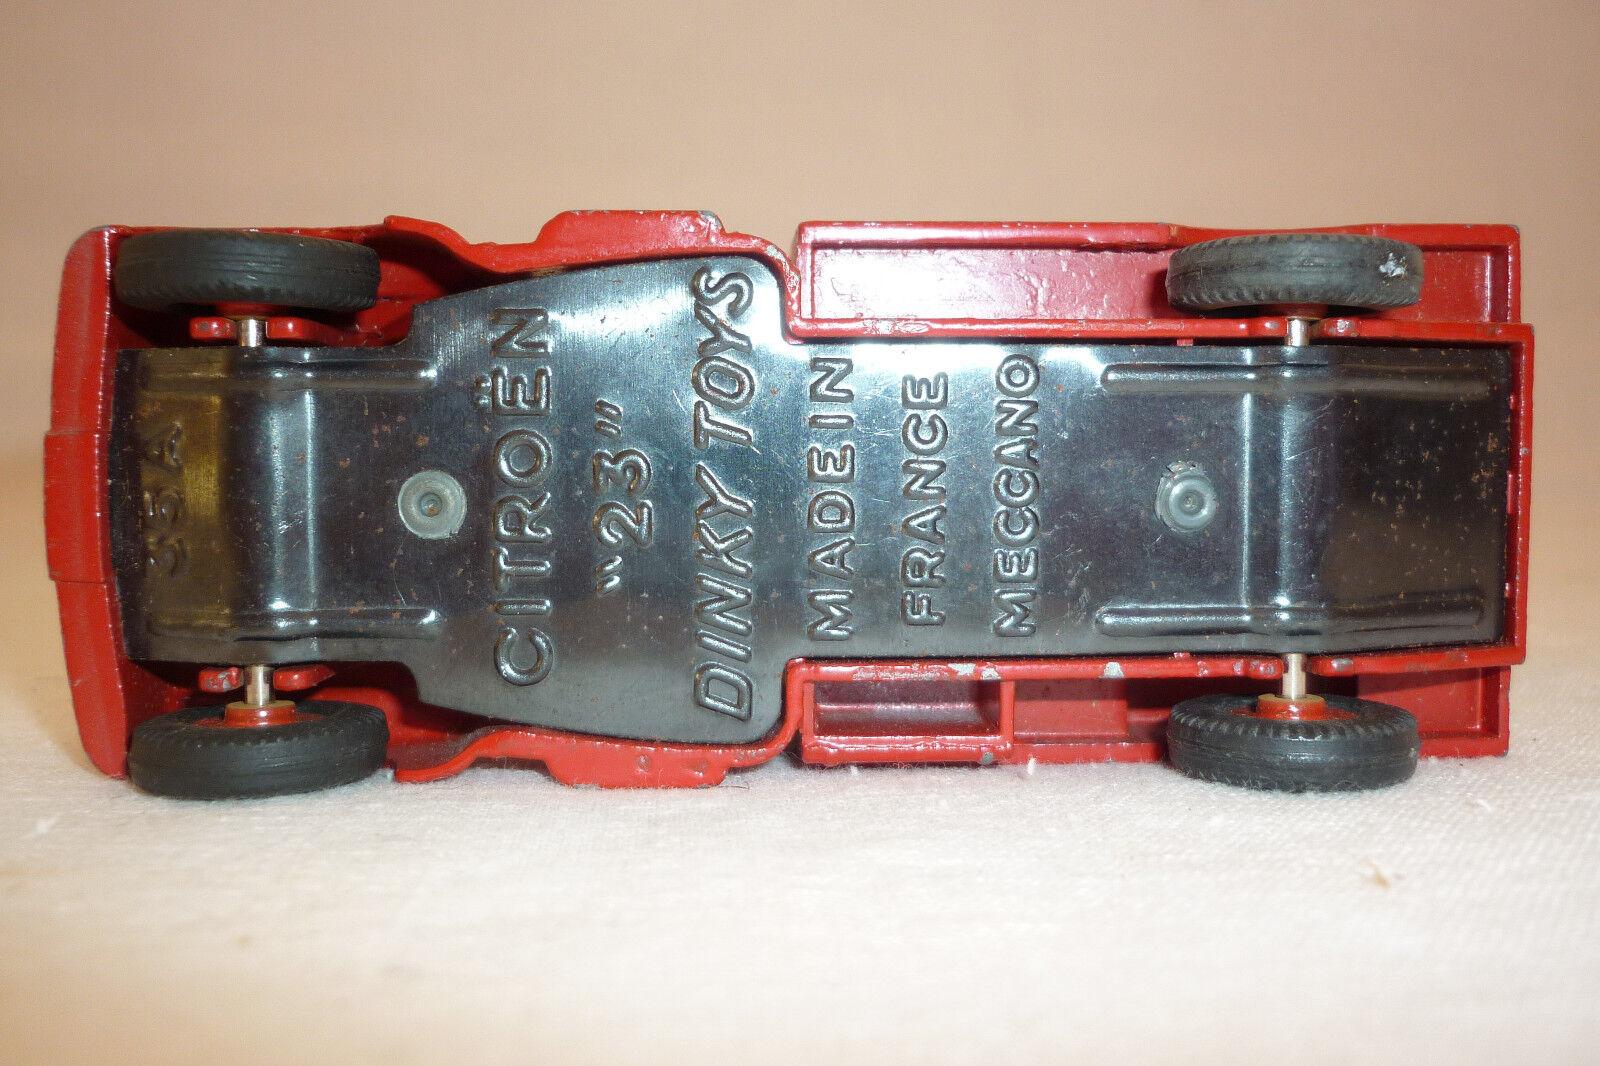 DINKY TOYS - - - VINTAGE METALLMODELL - CITROEN SERVICE - NO REPLIKA  (DINKY-T-63) 5afc98